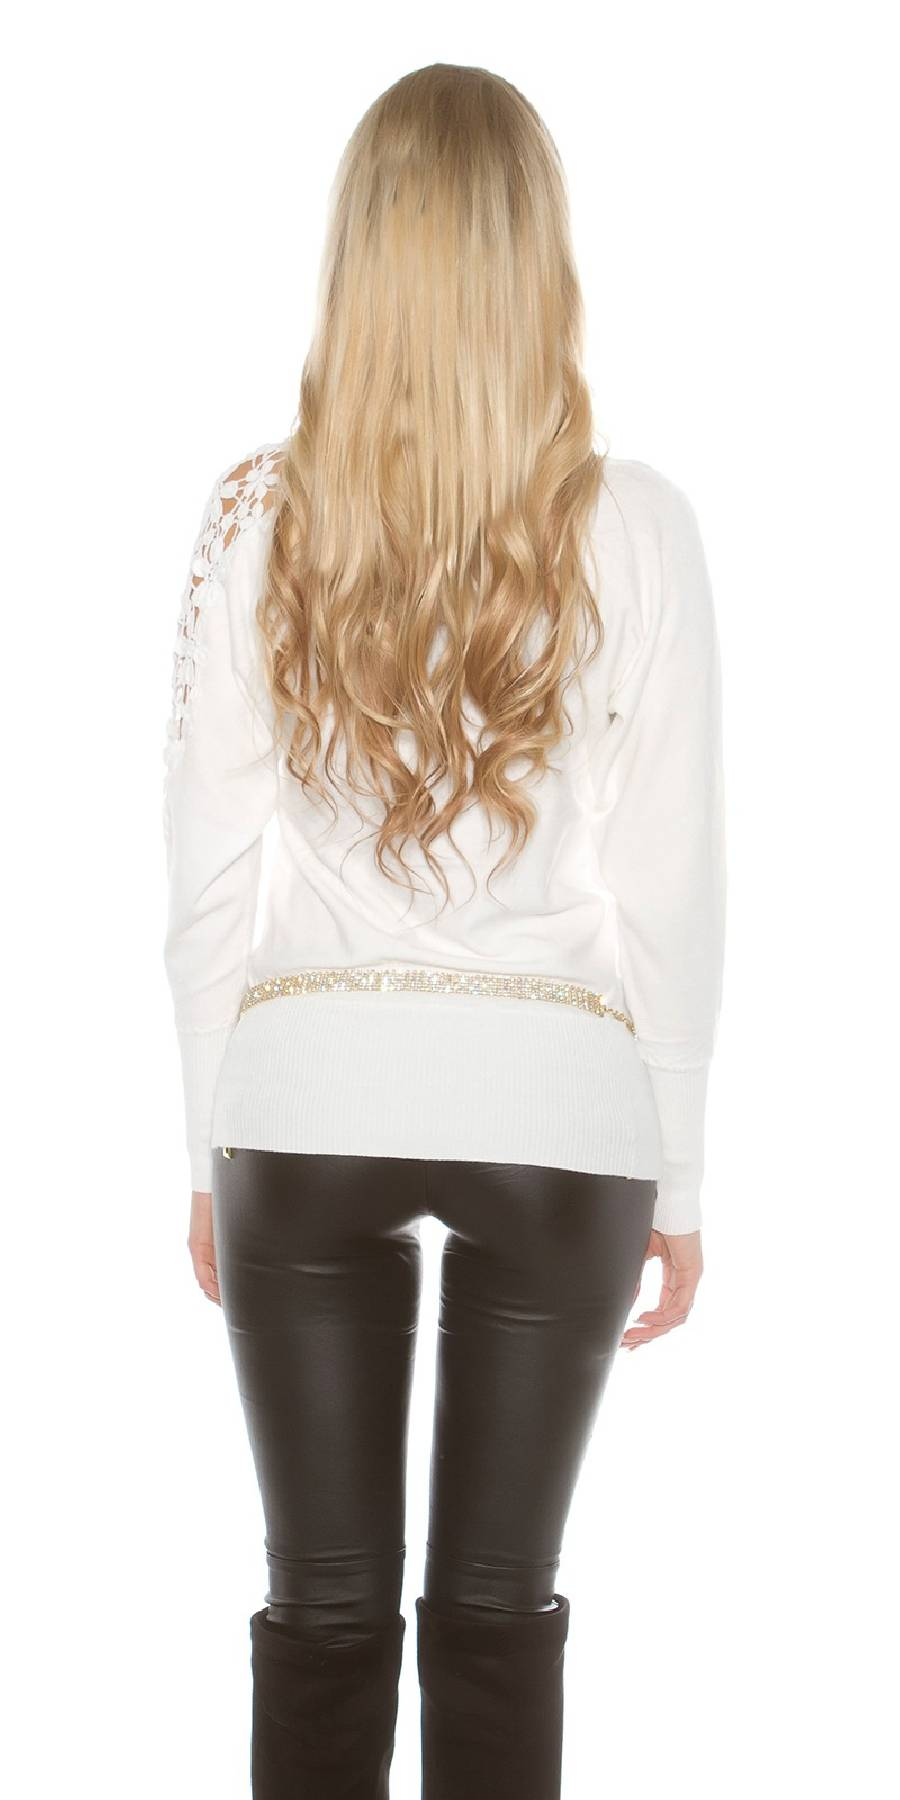 Jupe fashion tendance 2011 RABIA couleur beige